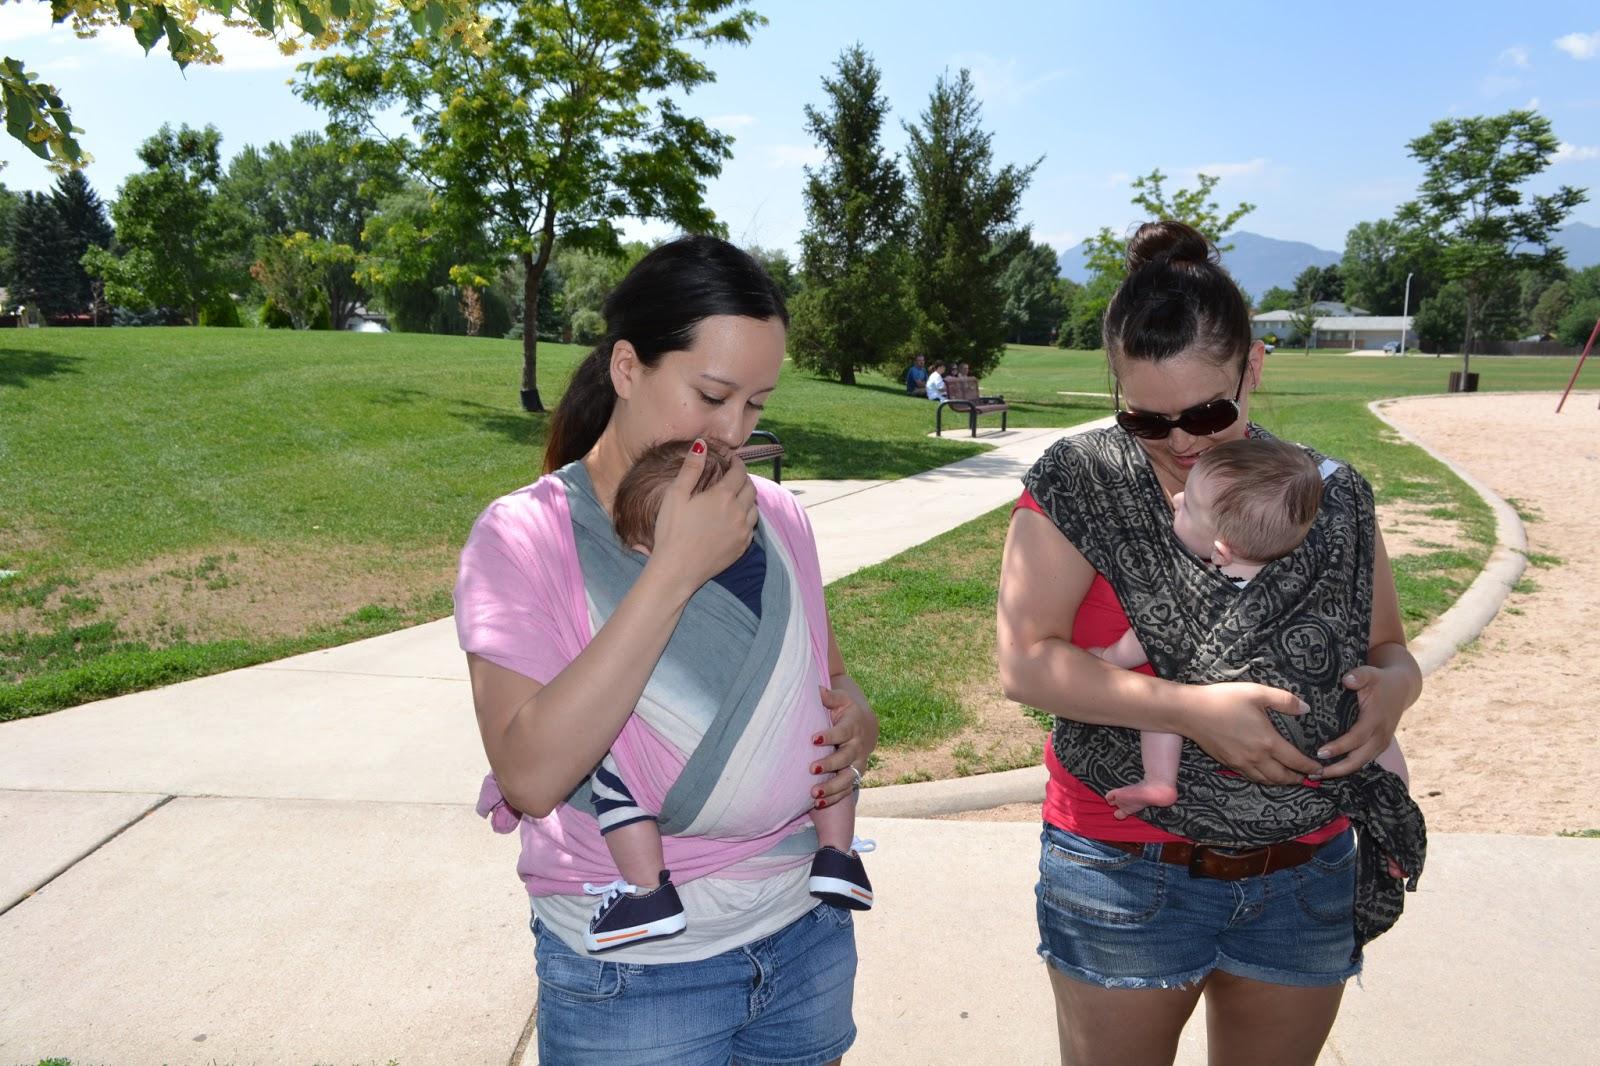 Babywearing International Of Colorado Springs July